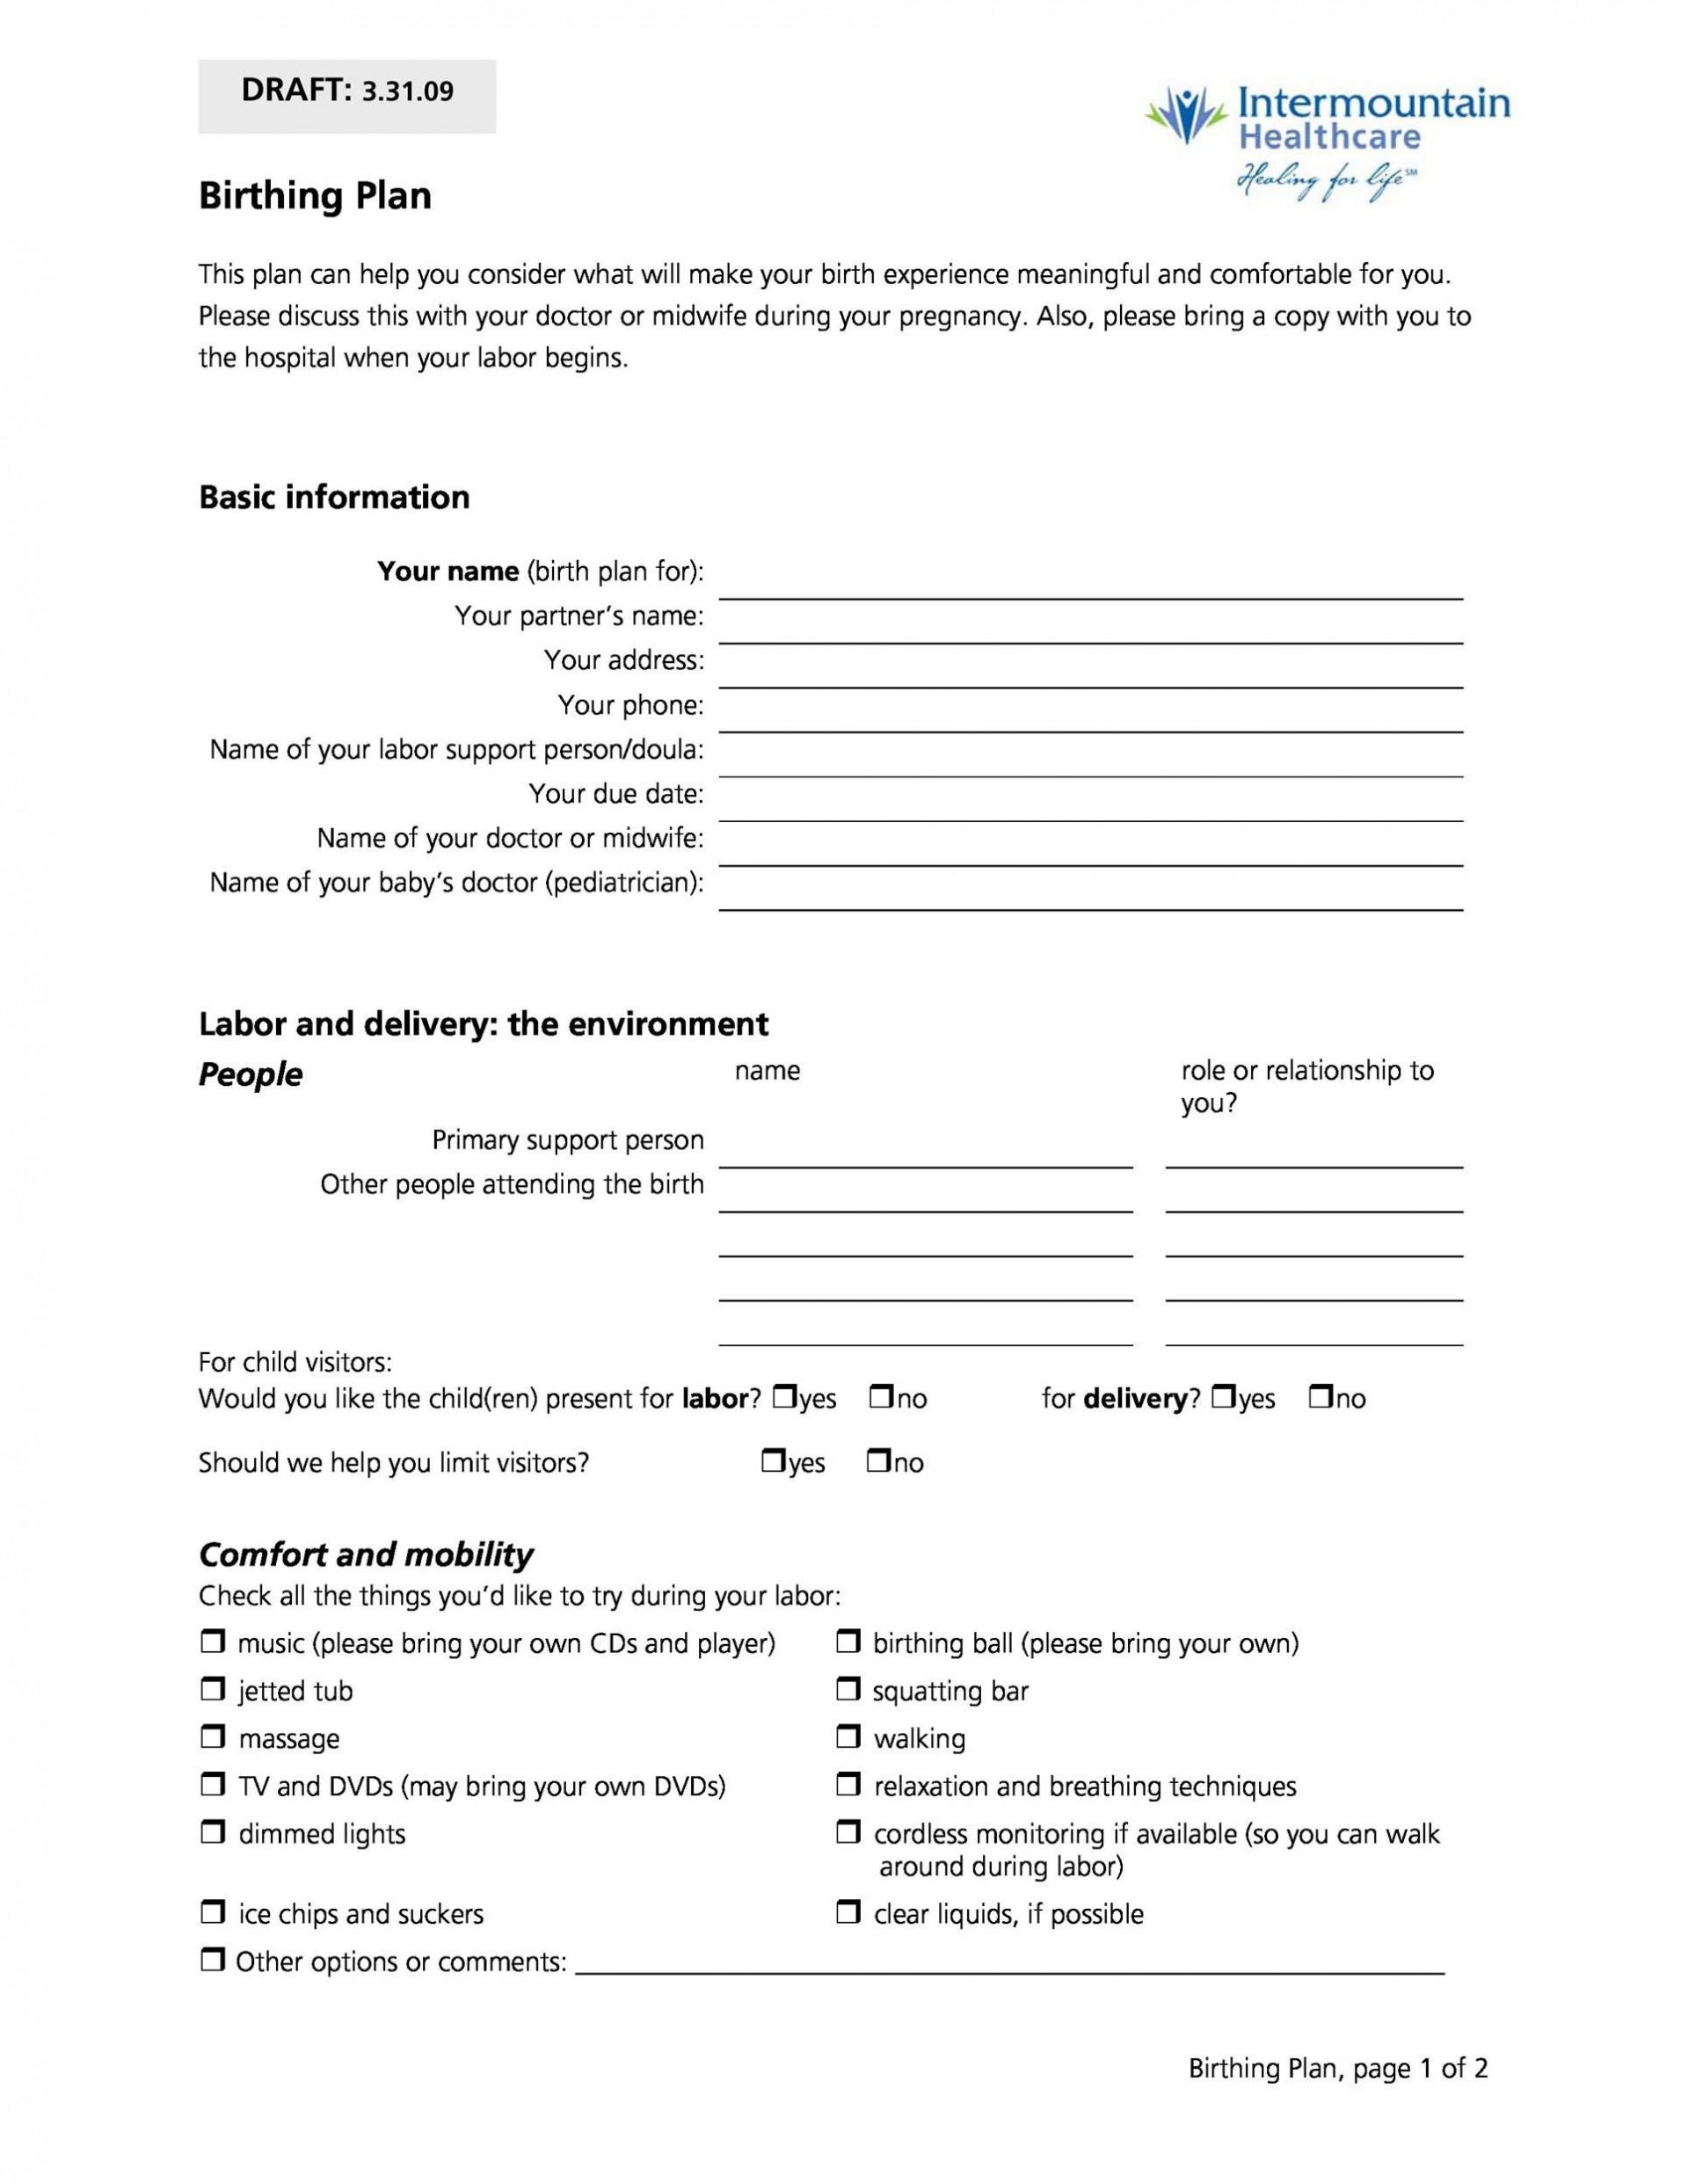 007 Archaicawful Printable Birth Plan Template High Definition  Editable Pdf Free1920